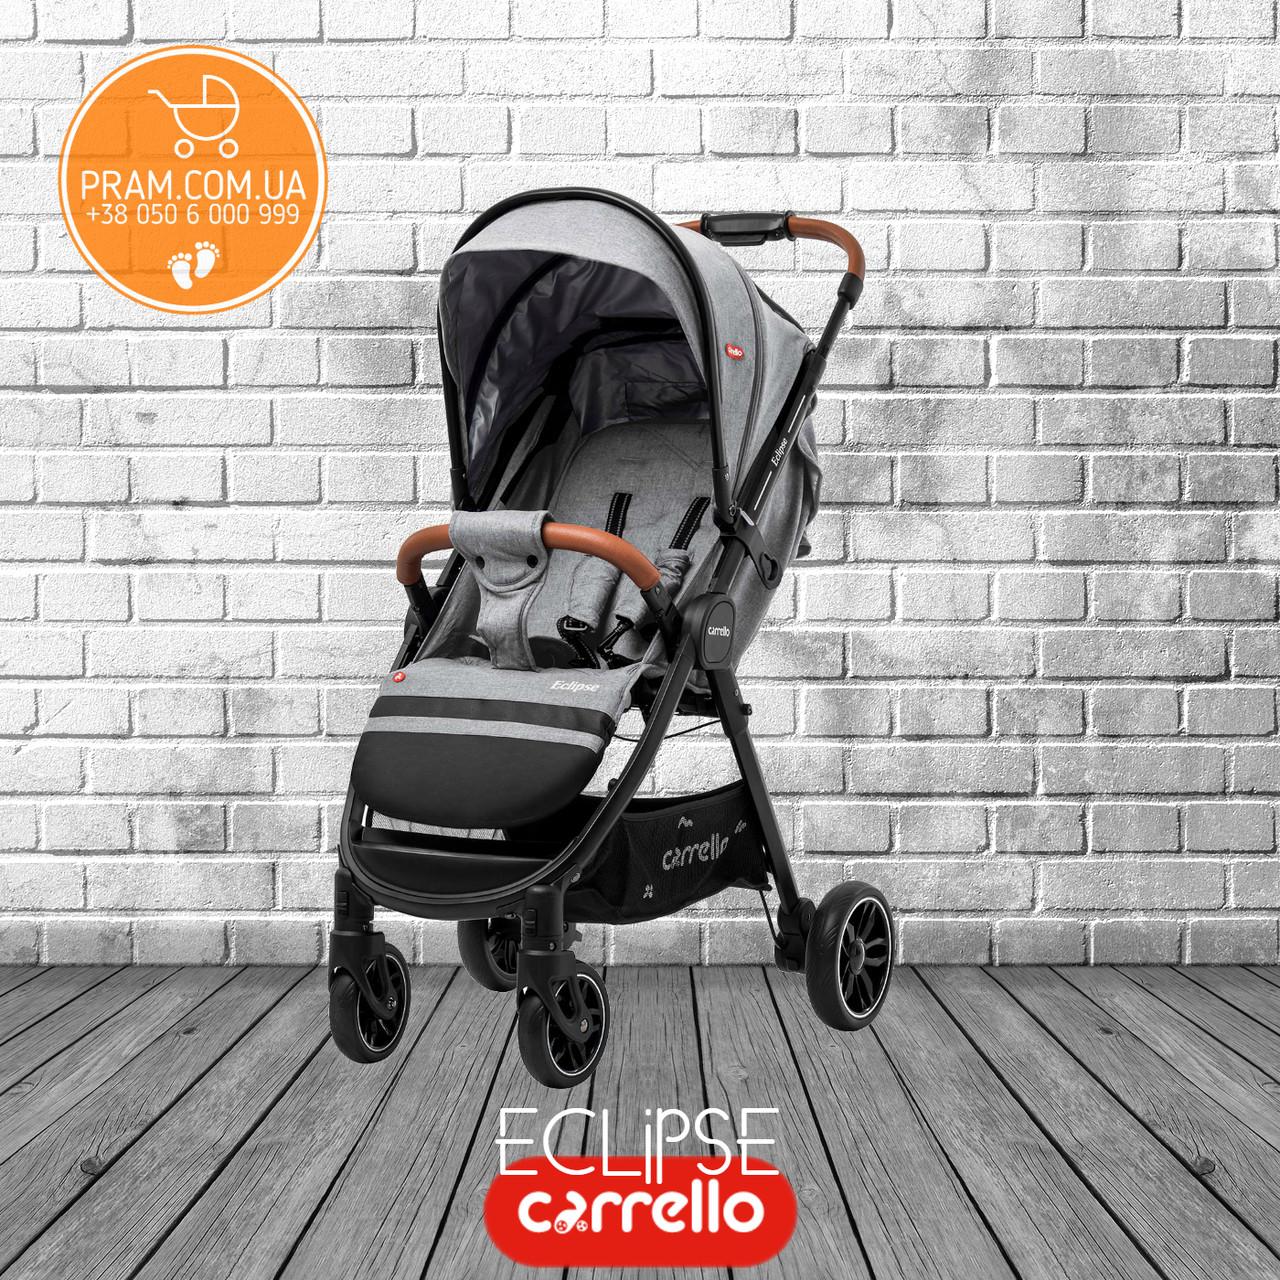 CARRELLO ECLIPSE CRL-12001 Len прогулочная коляска Mosaic Gray Светло-серый